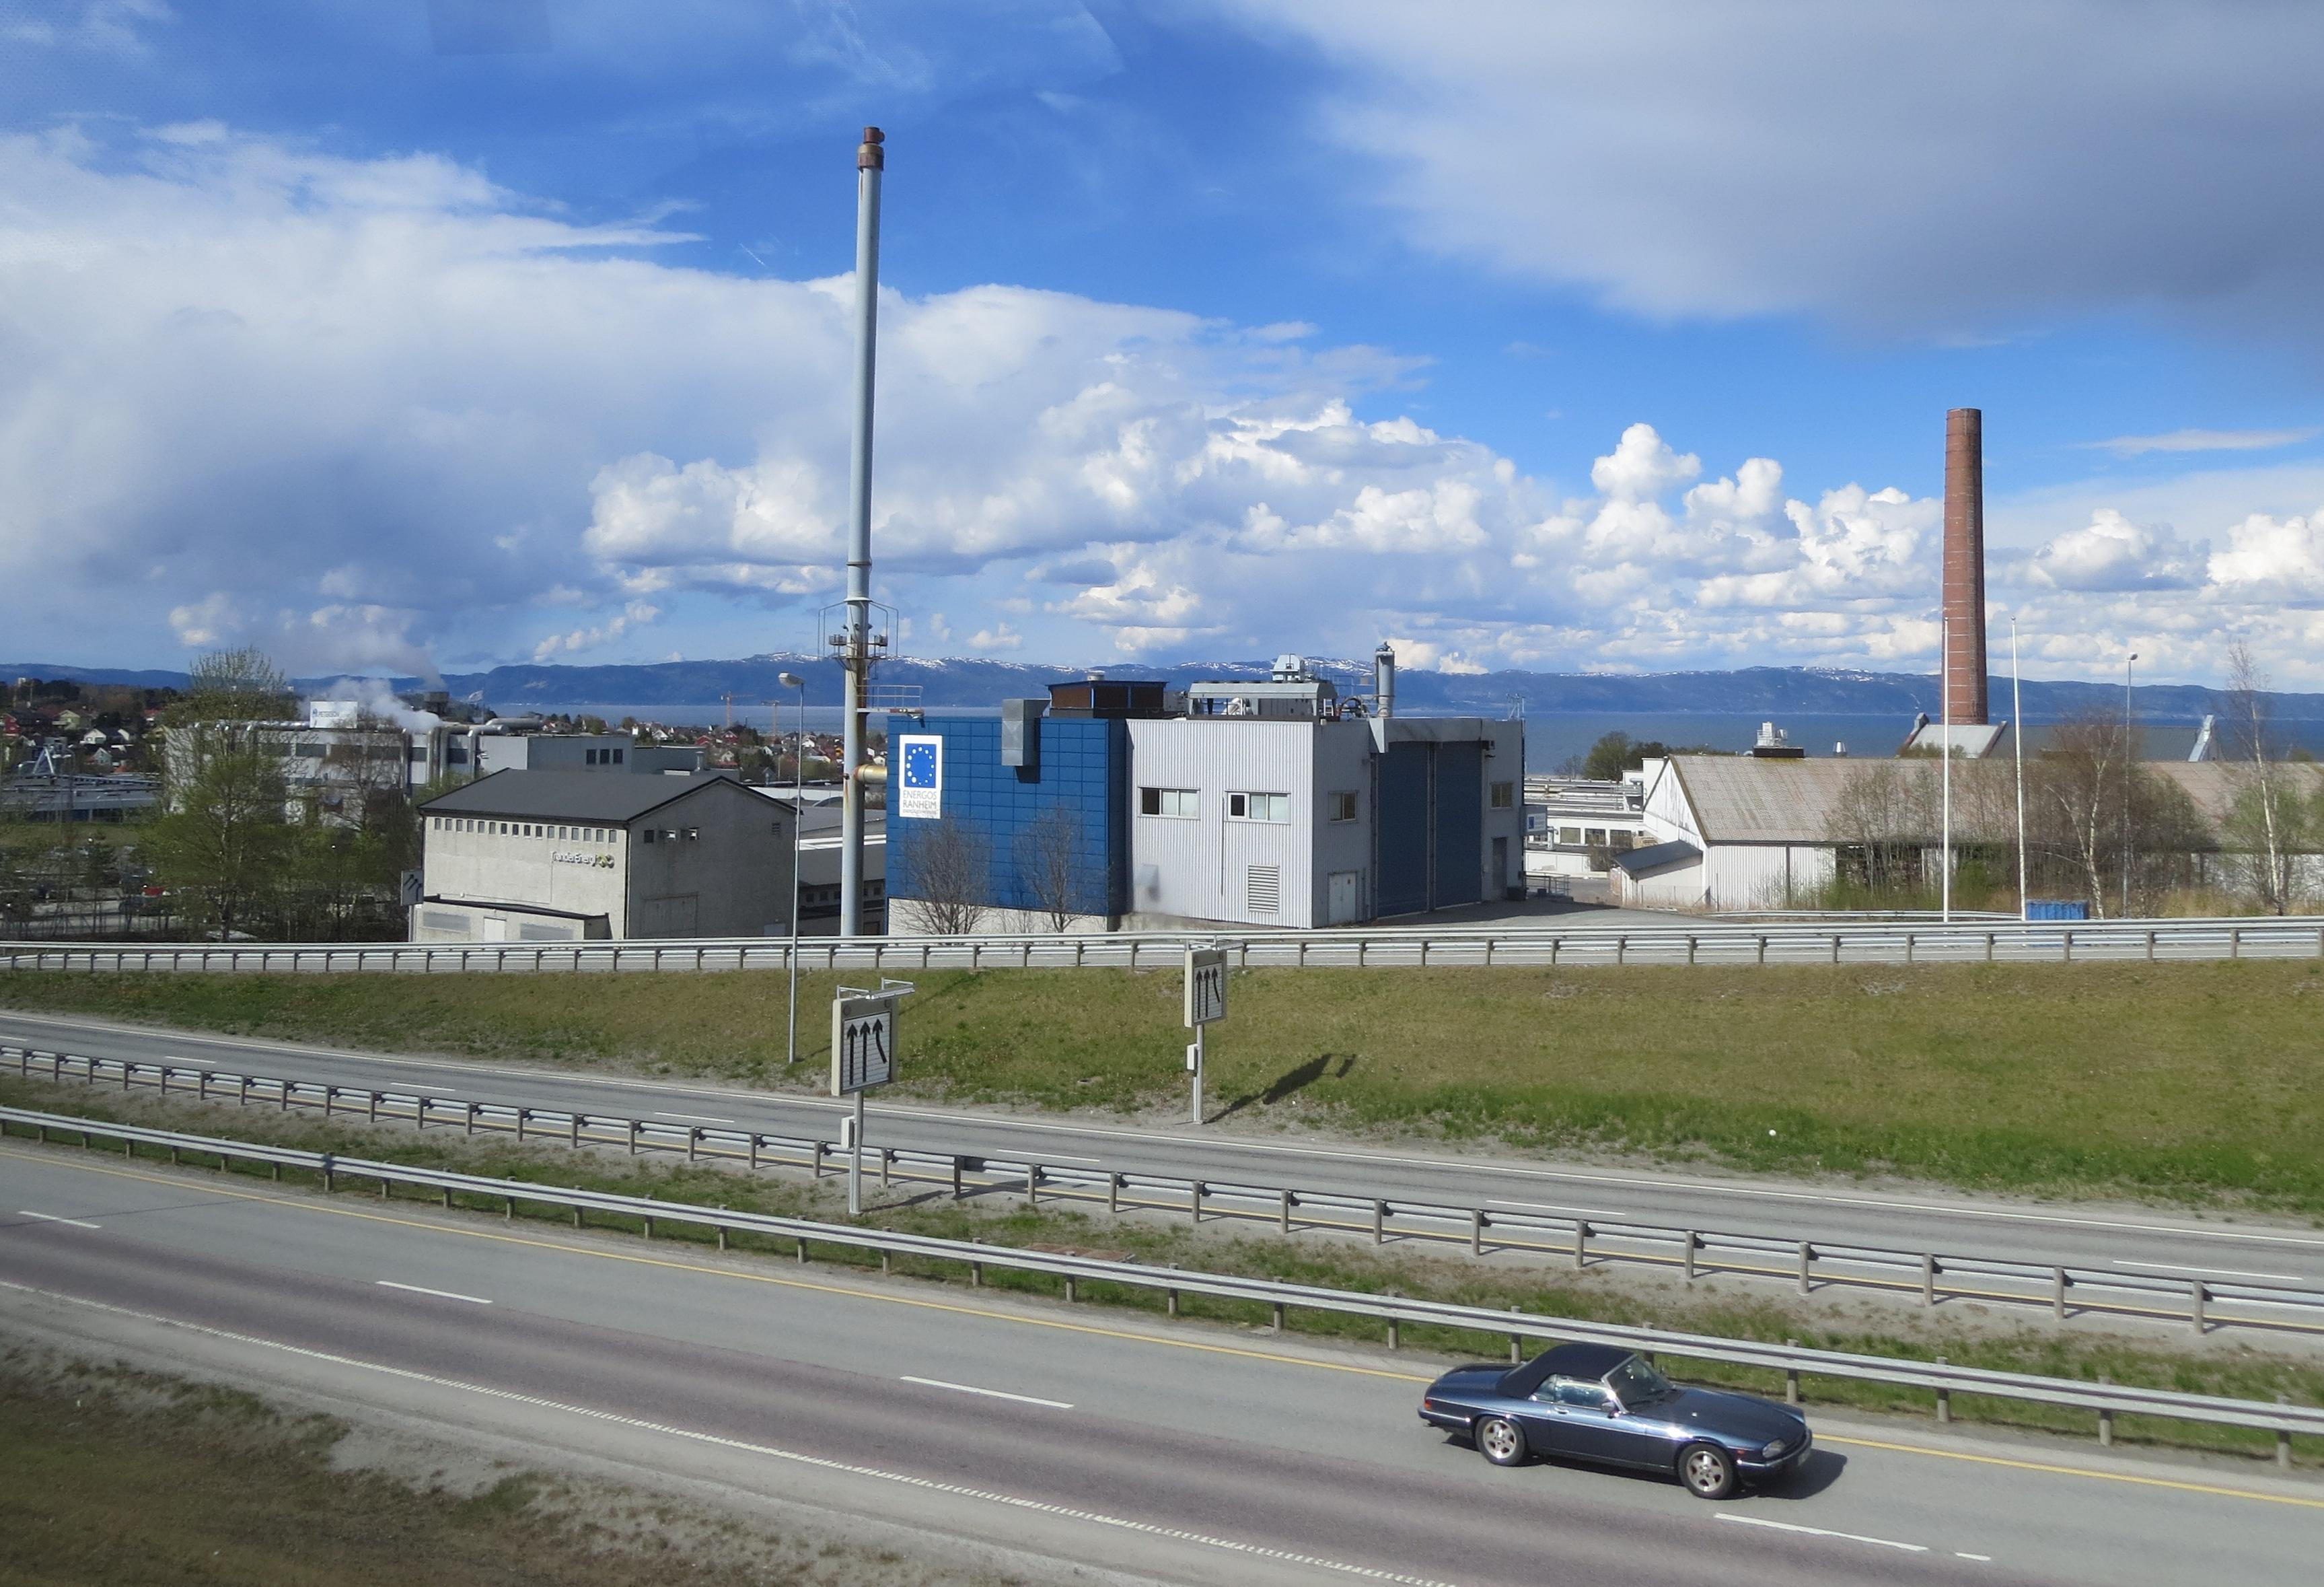 File:Troenderenergi Energos Ranheim IMG 6098.JPG ...